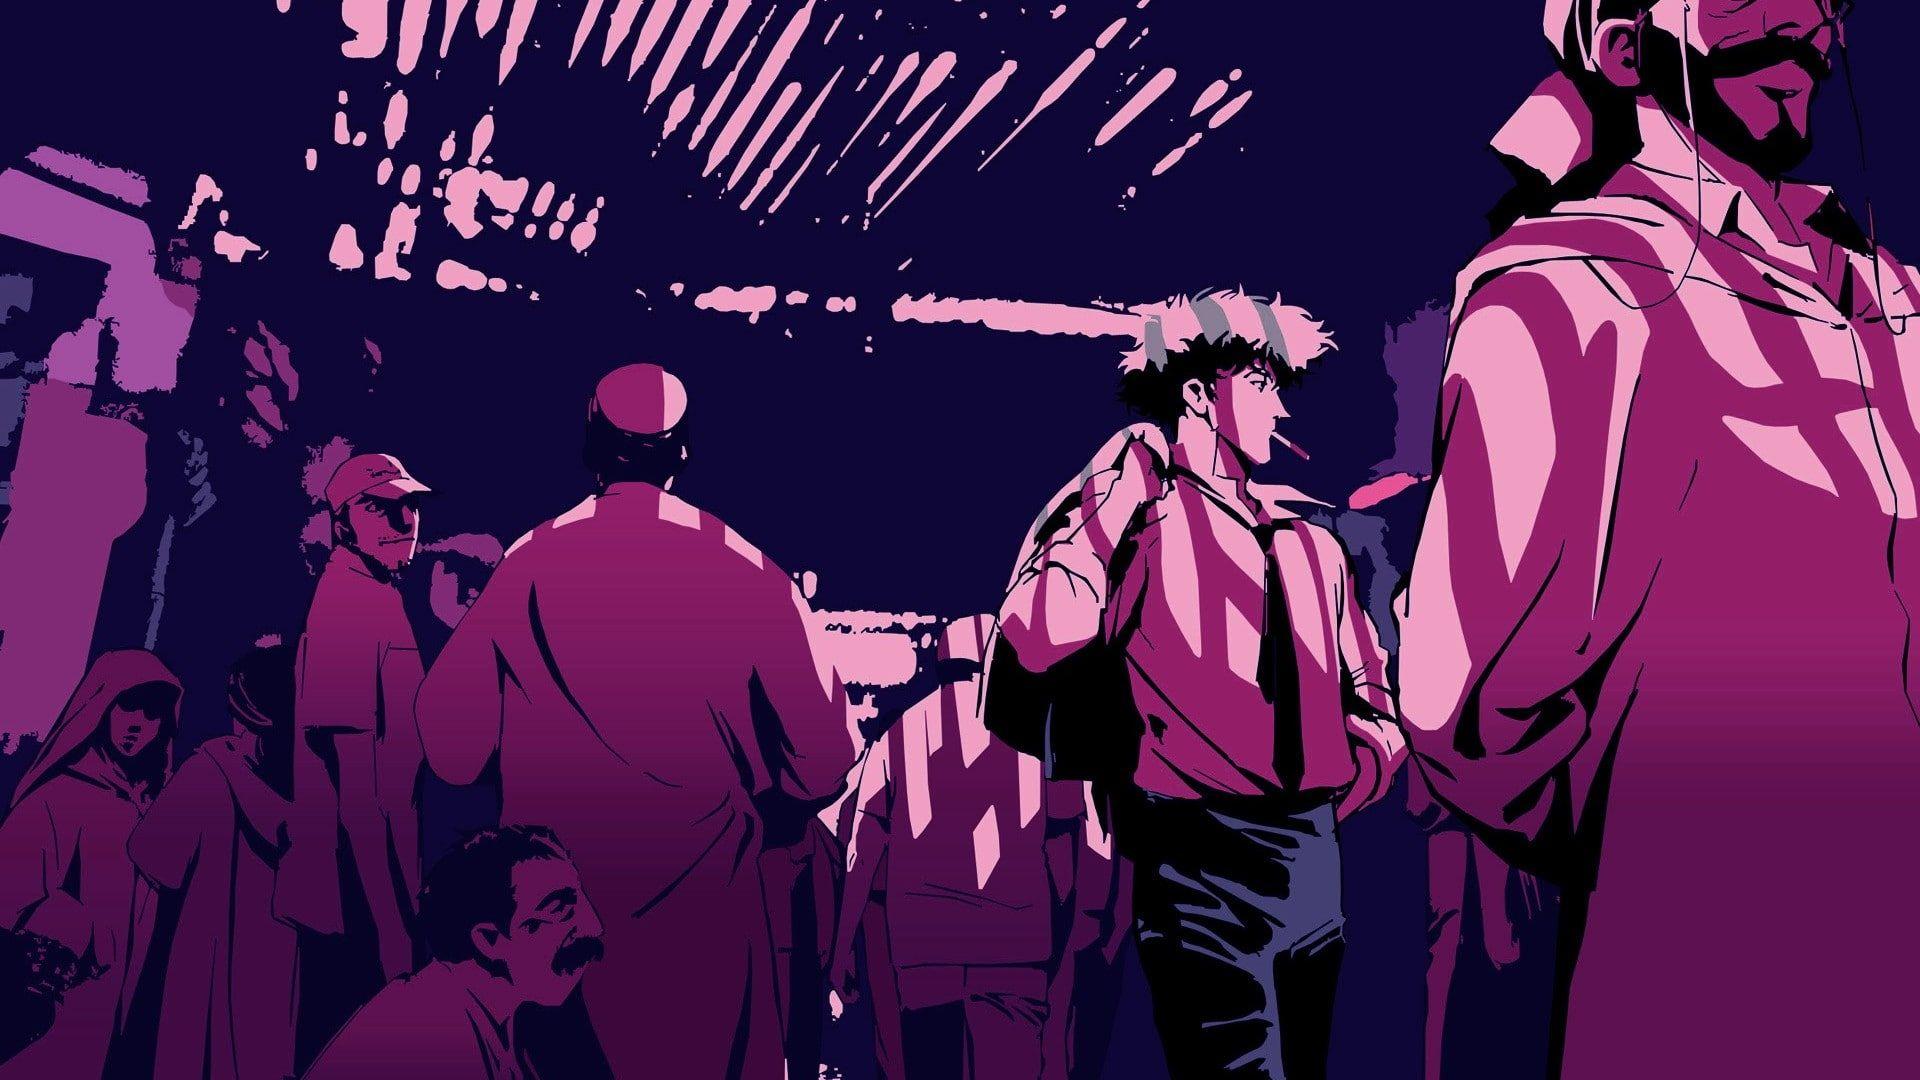 Cowboy Bebop Anime Purple Hd Anime Portrait Poster Cartoon Comic Anime Purple Cowboy Bebop 1080p In 2021 Cowboy Bebop Wallpapers Cowboy Bebop Cowboy Bebop Anime